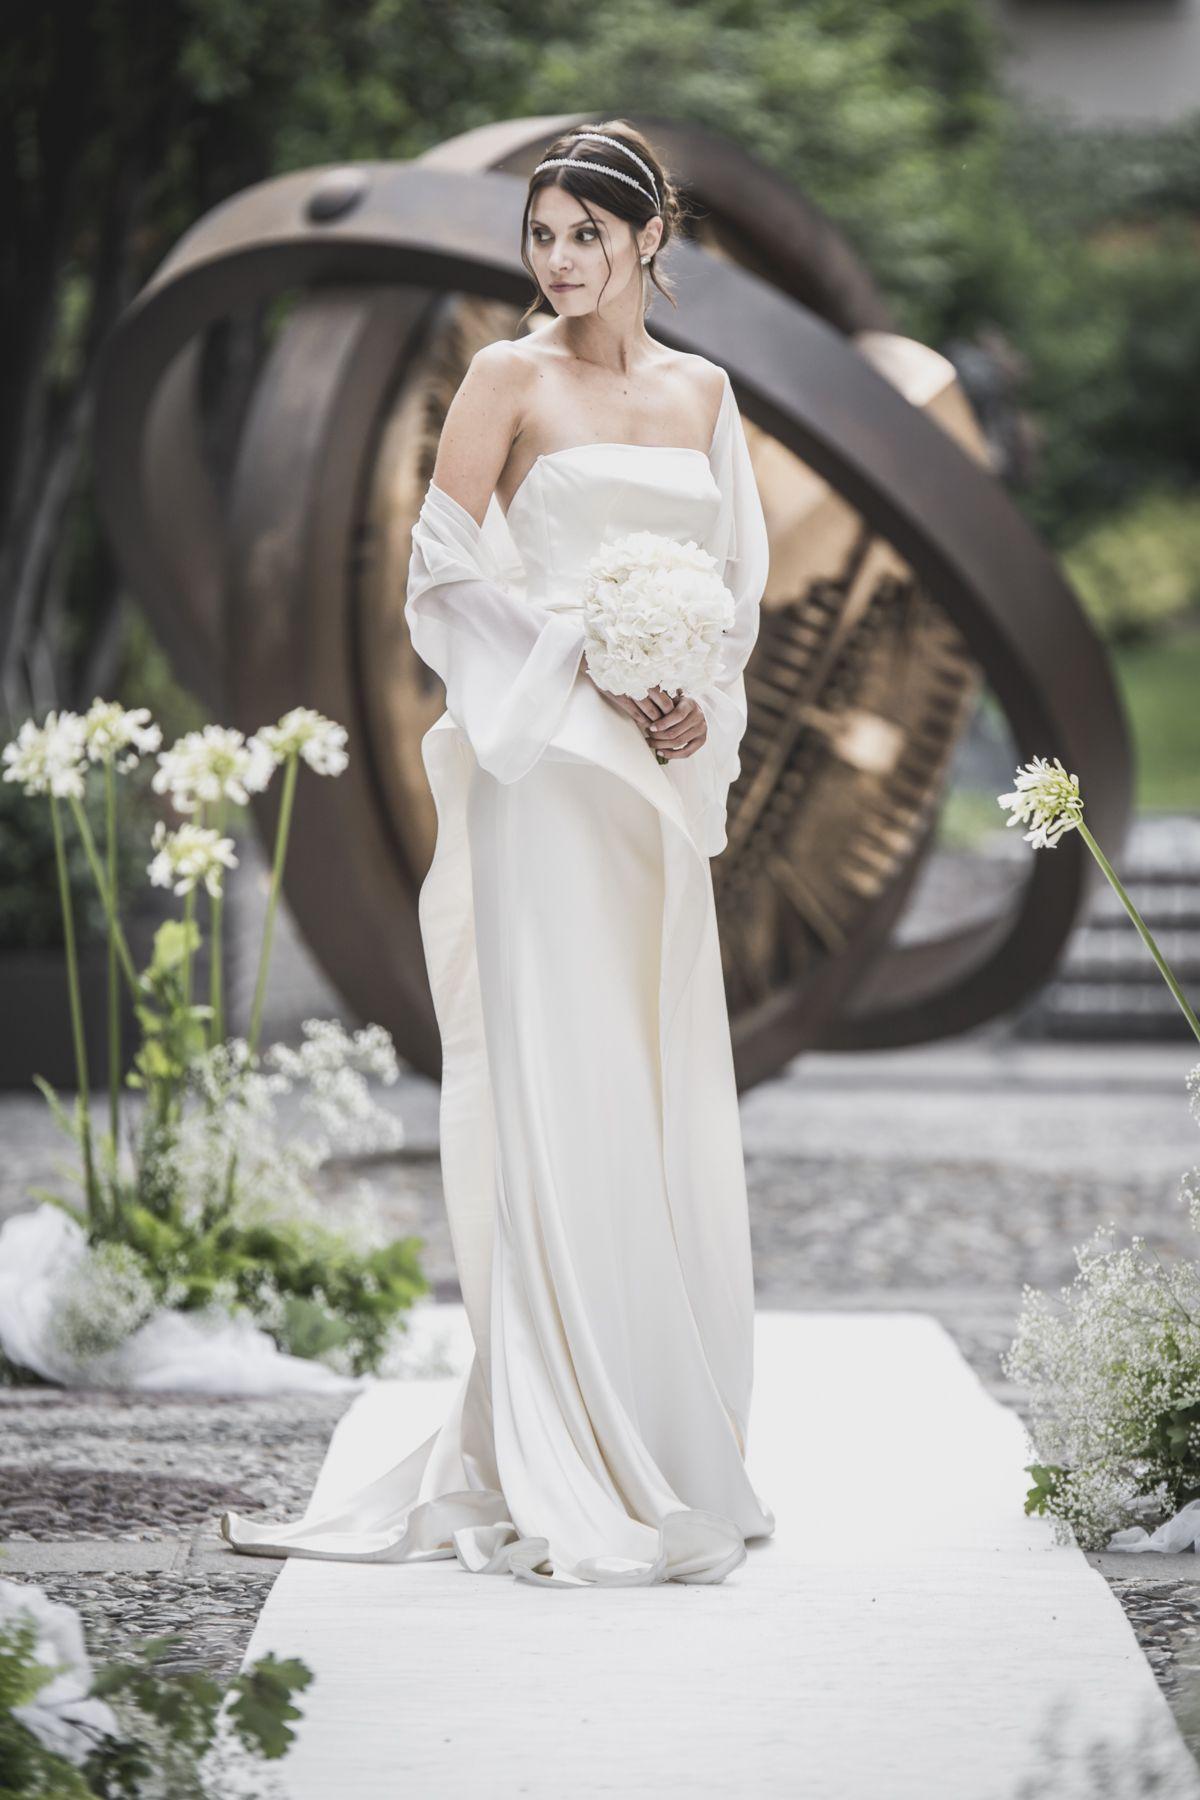 Wedding surprise spring edition thanks to mbwedding patner bridal